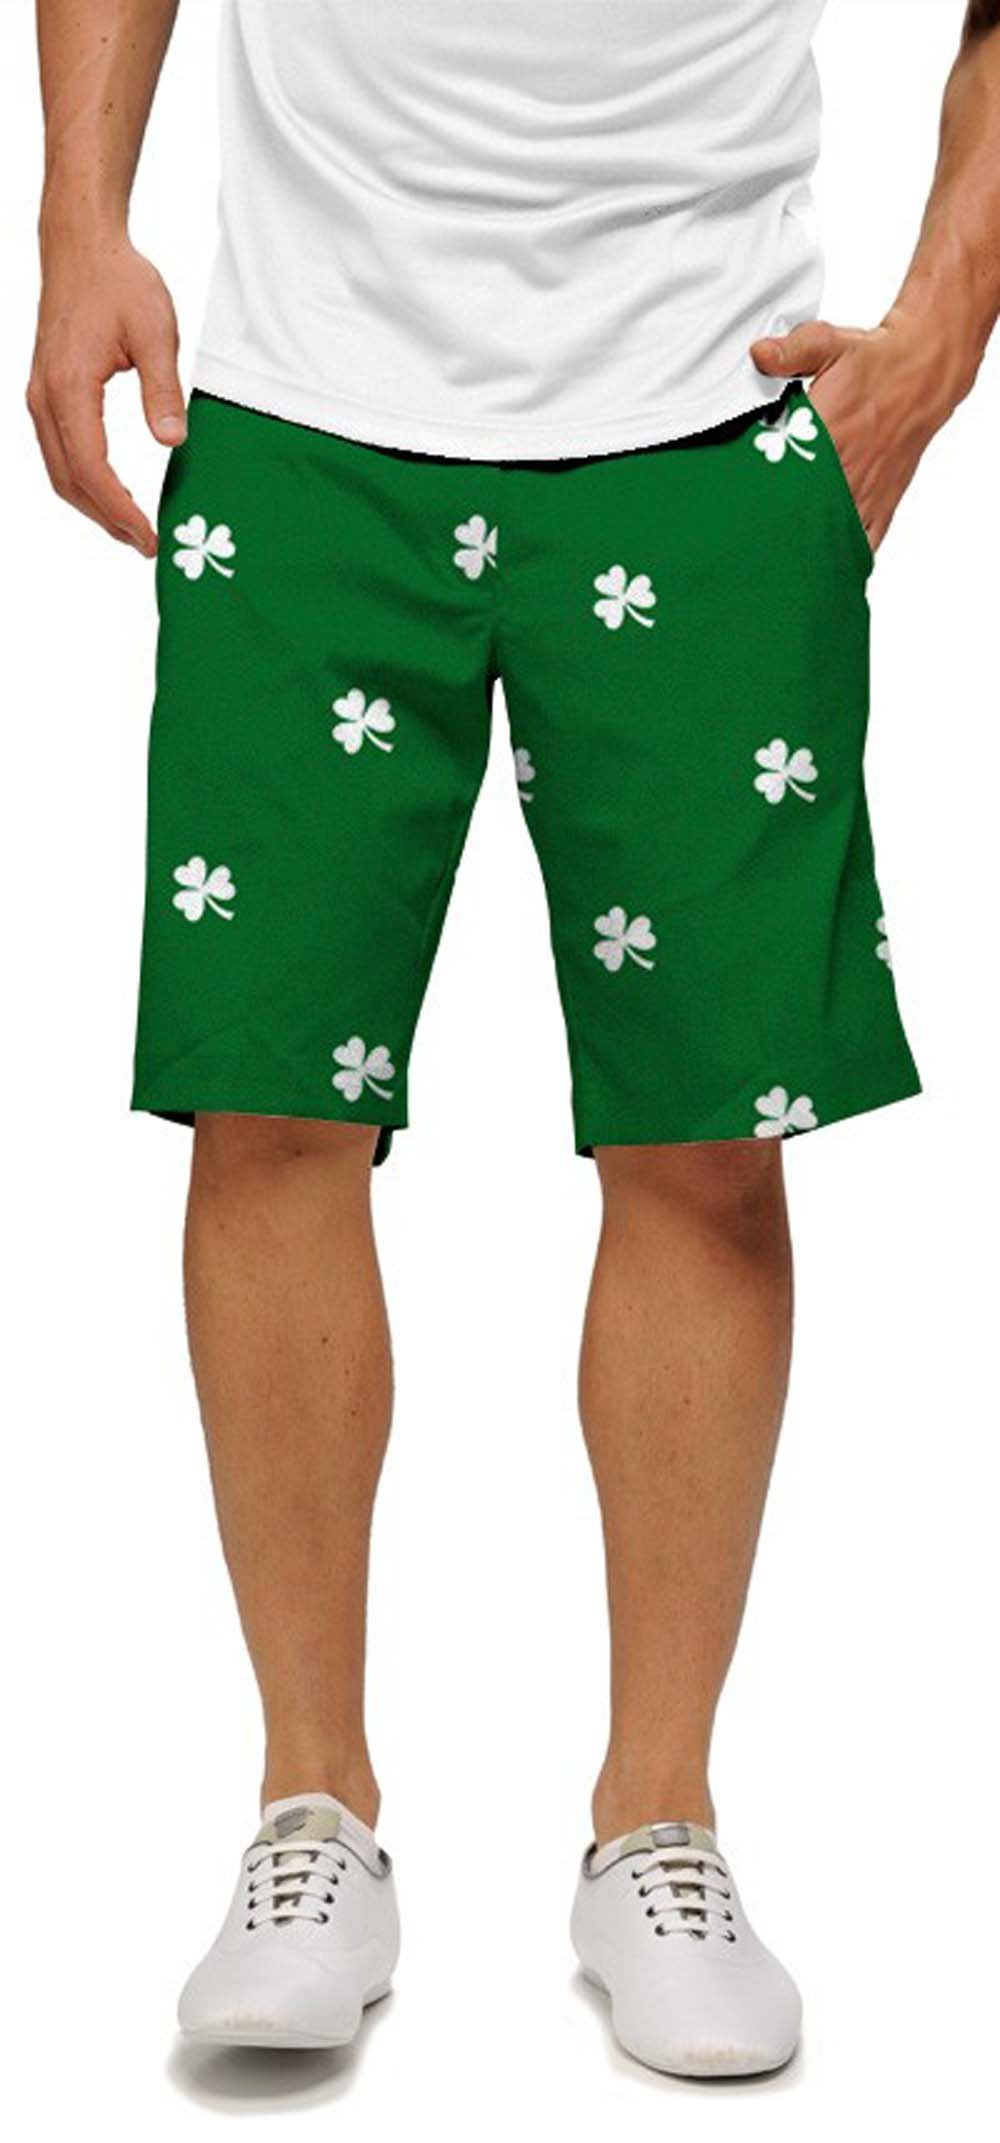 Loudmouth Golf Shamrocks Shorts (32 x 11)